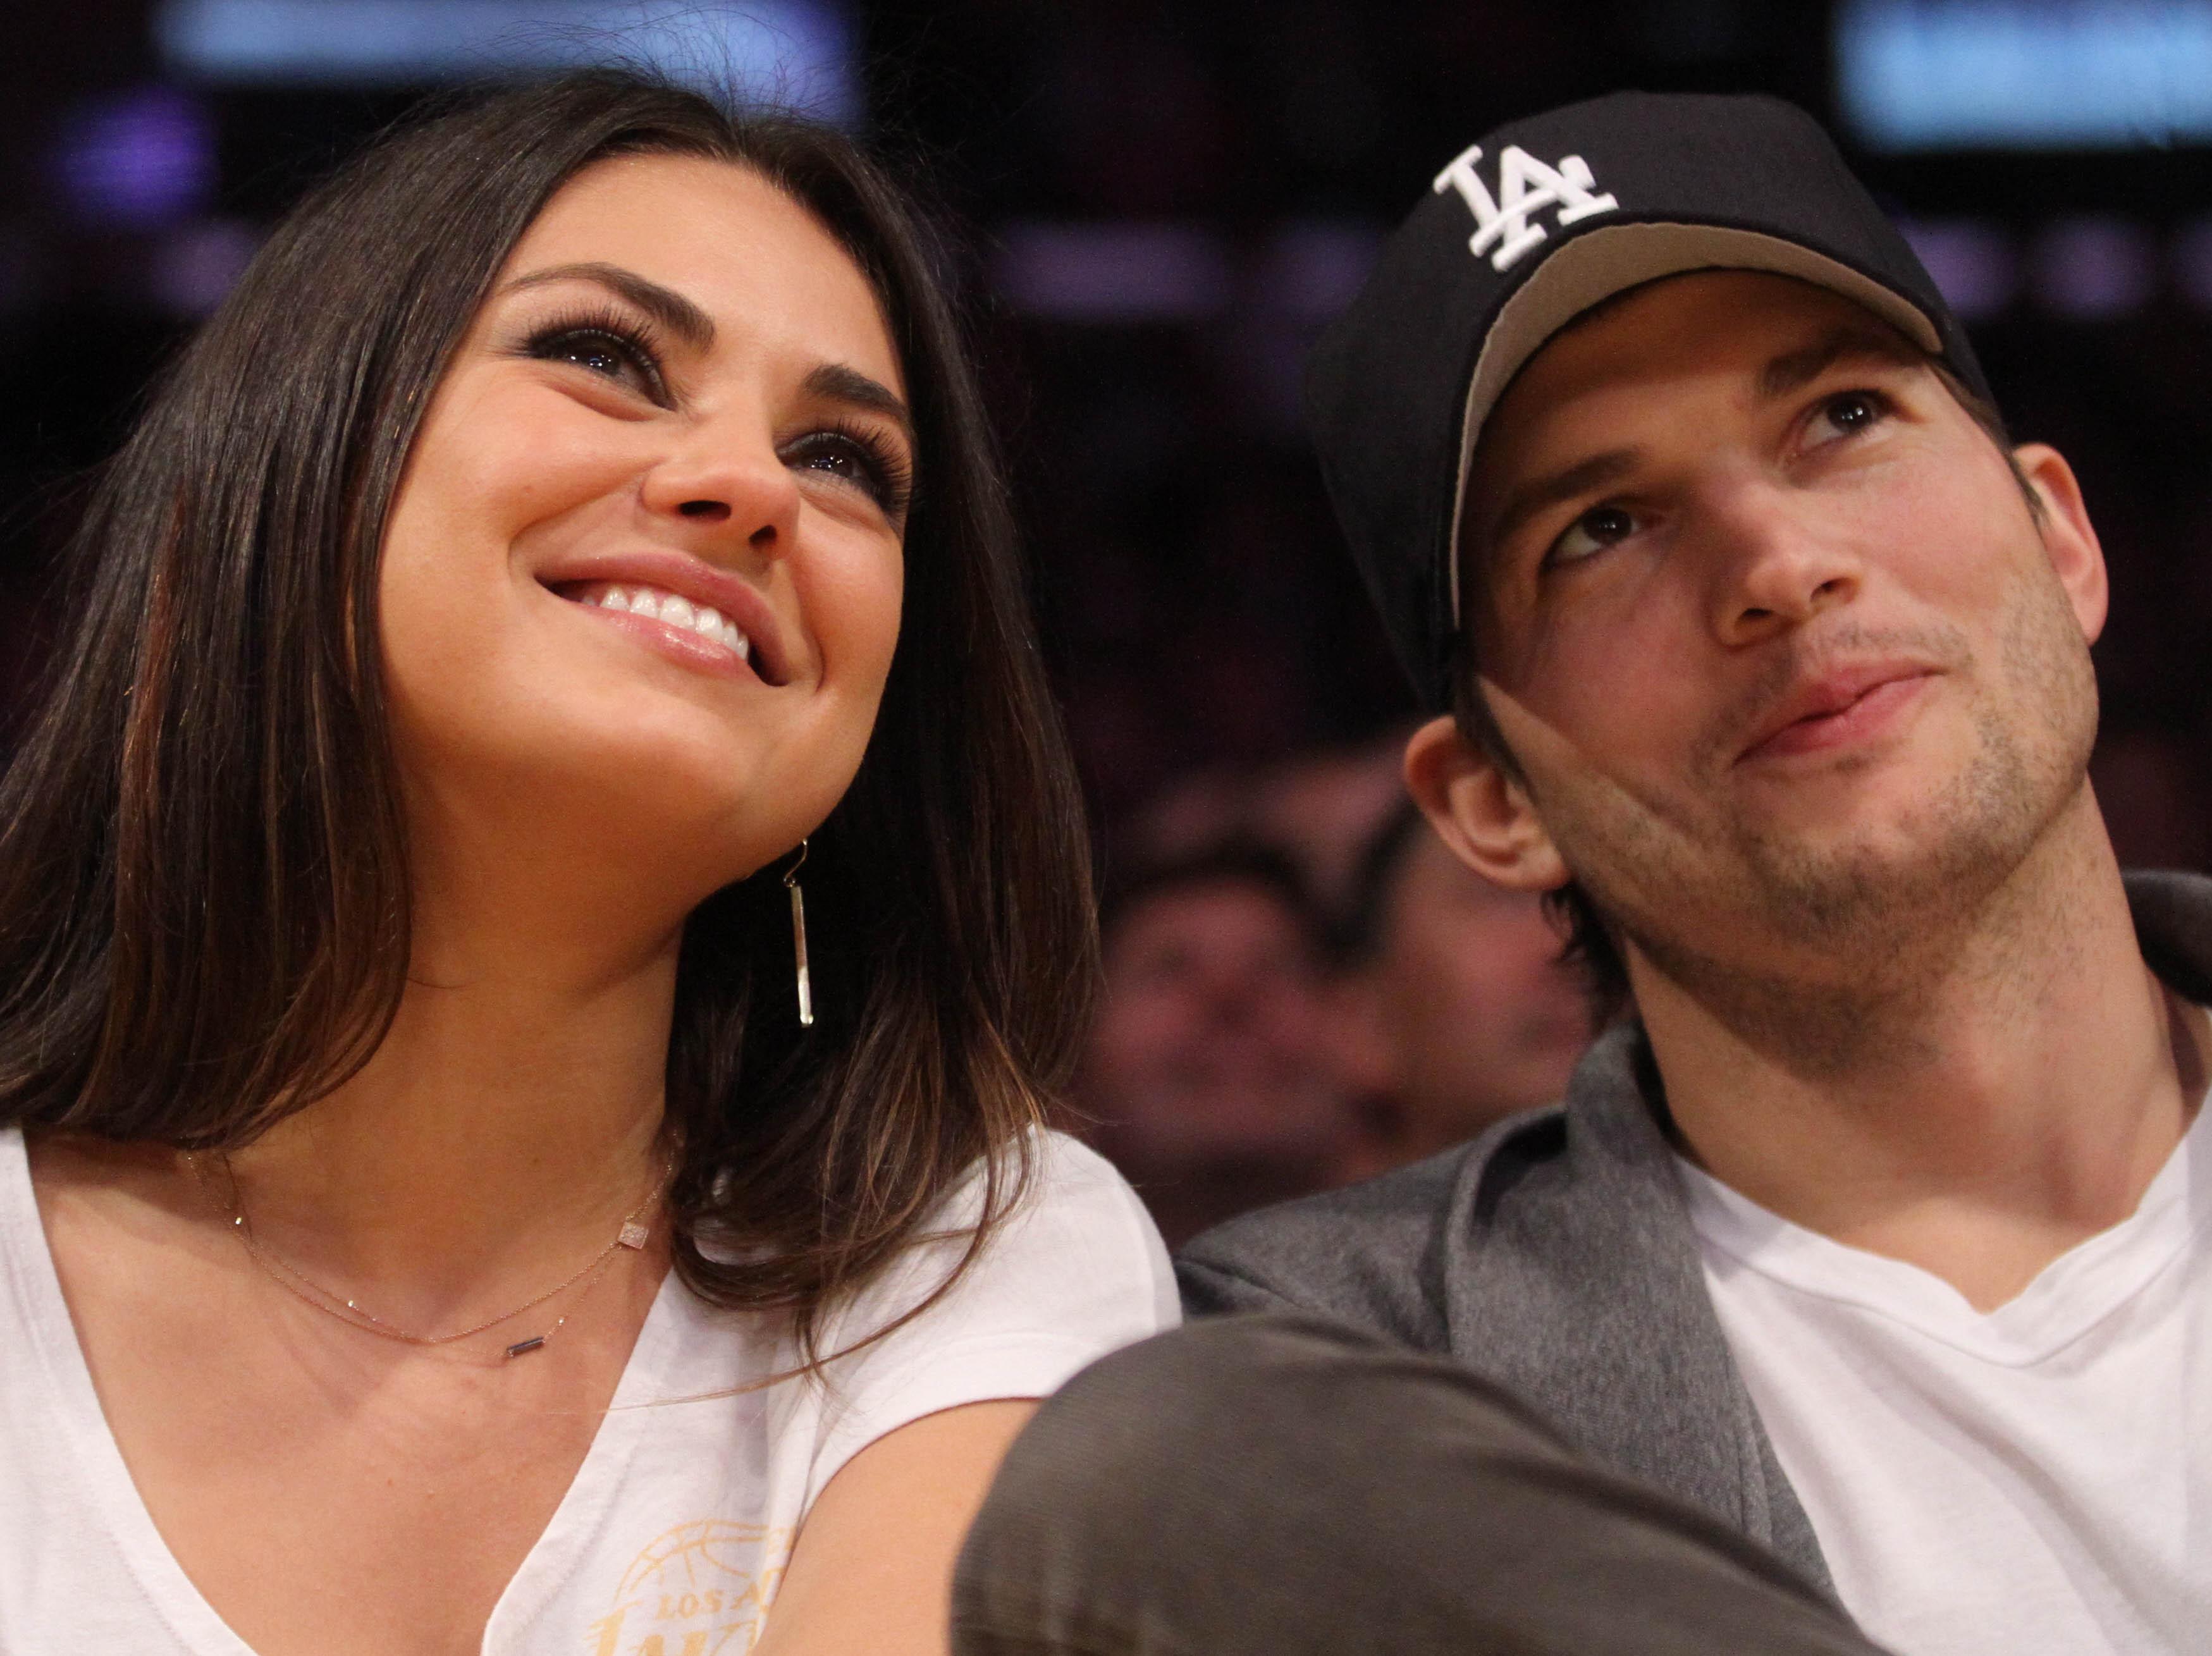 Mila-Kunis-et-Ashton-Kutcher-dans-Wonder-Twins-